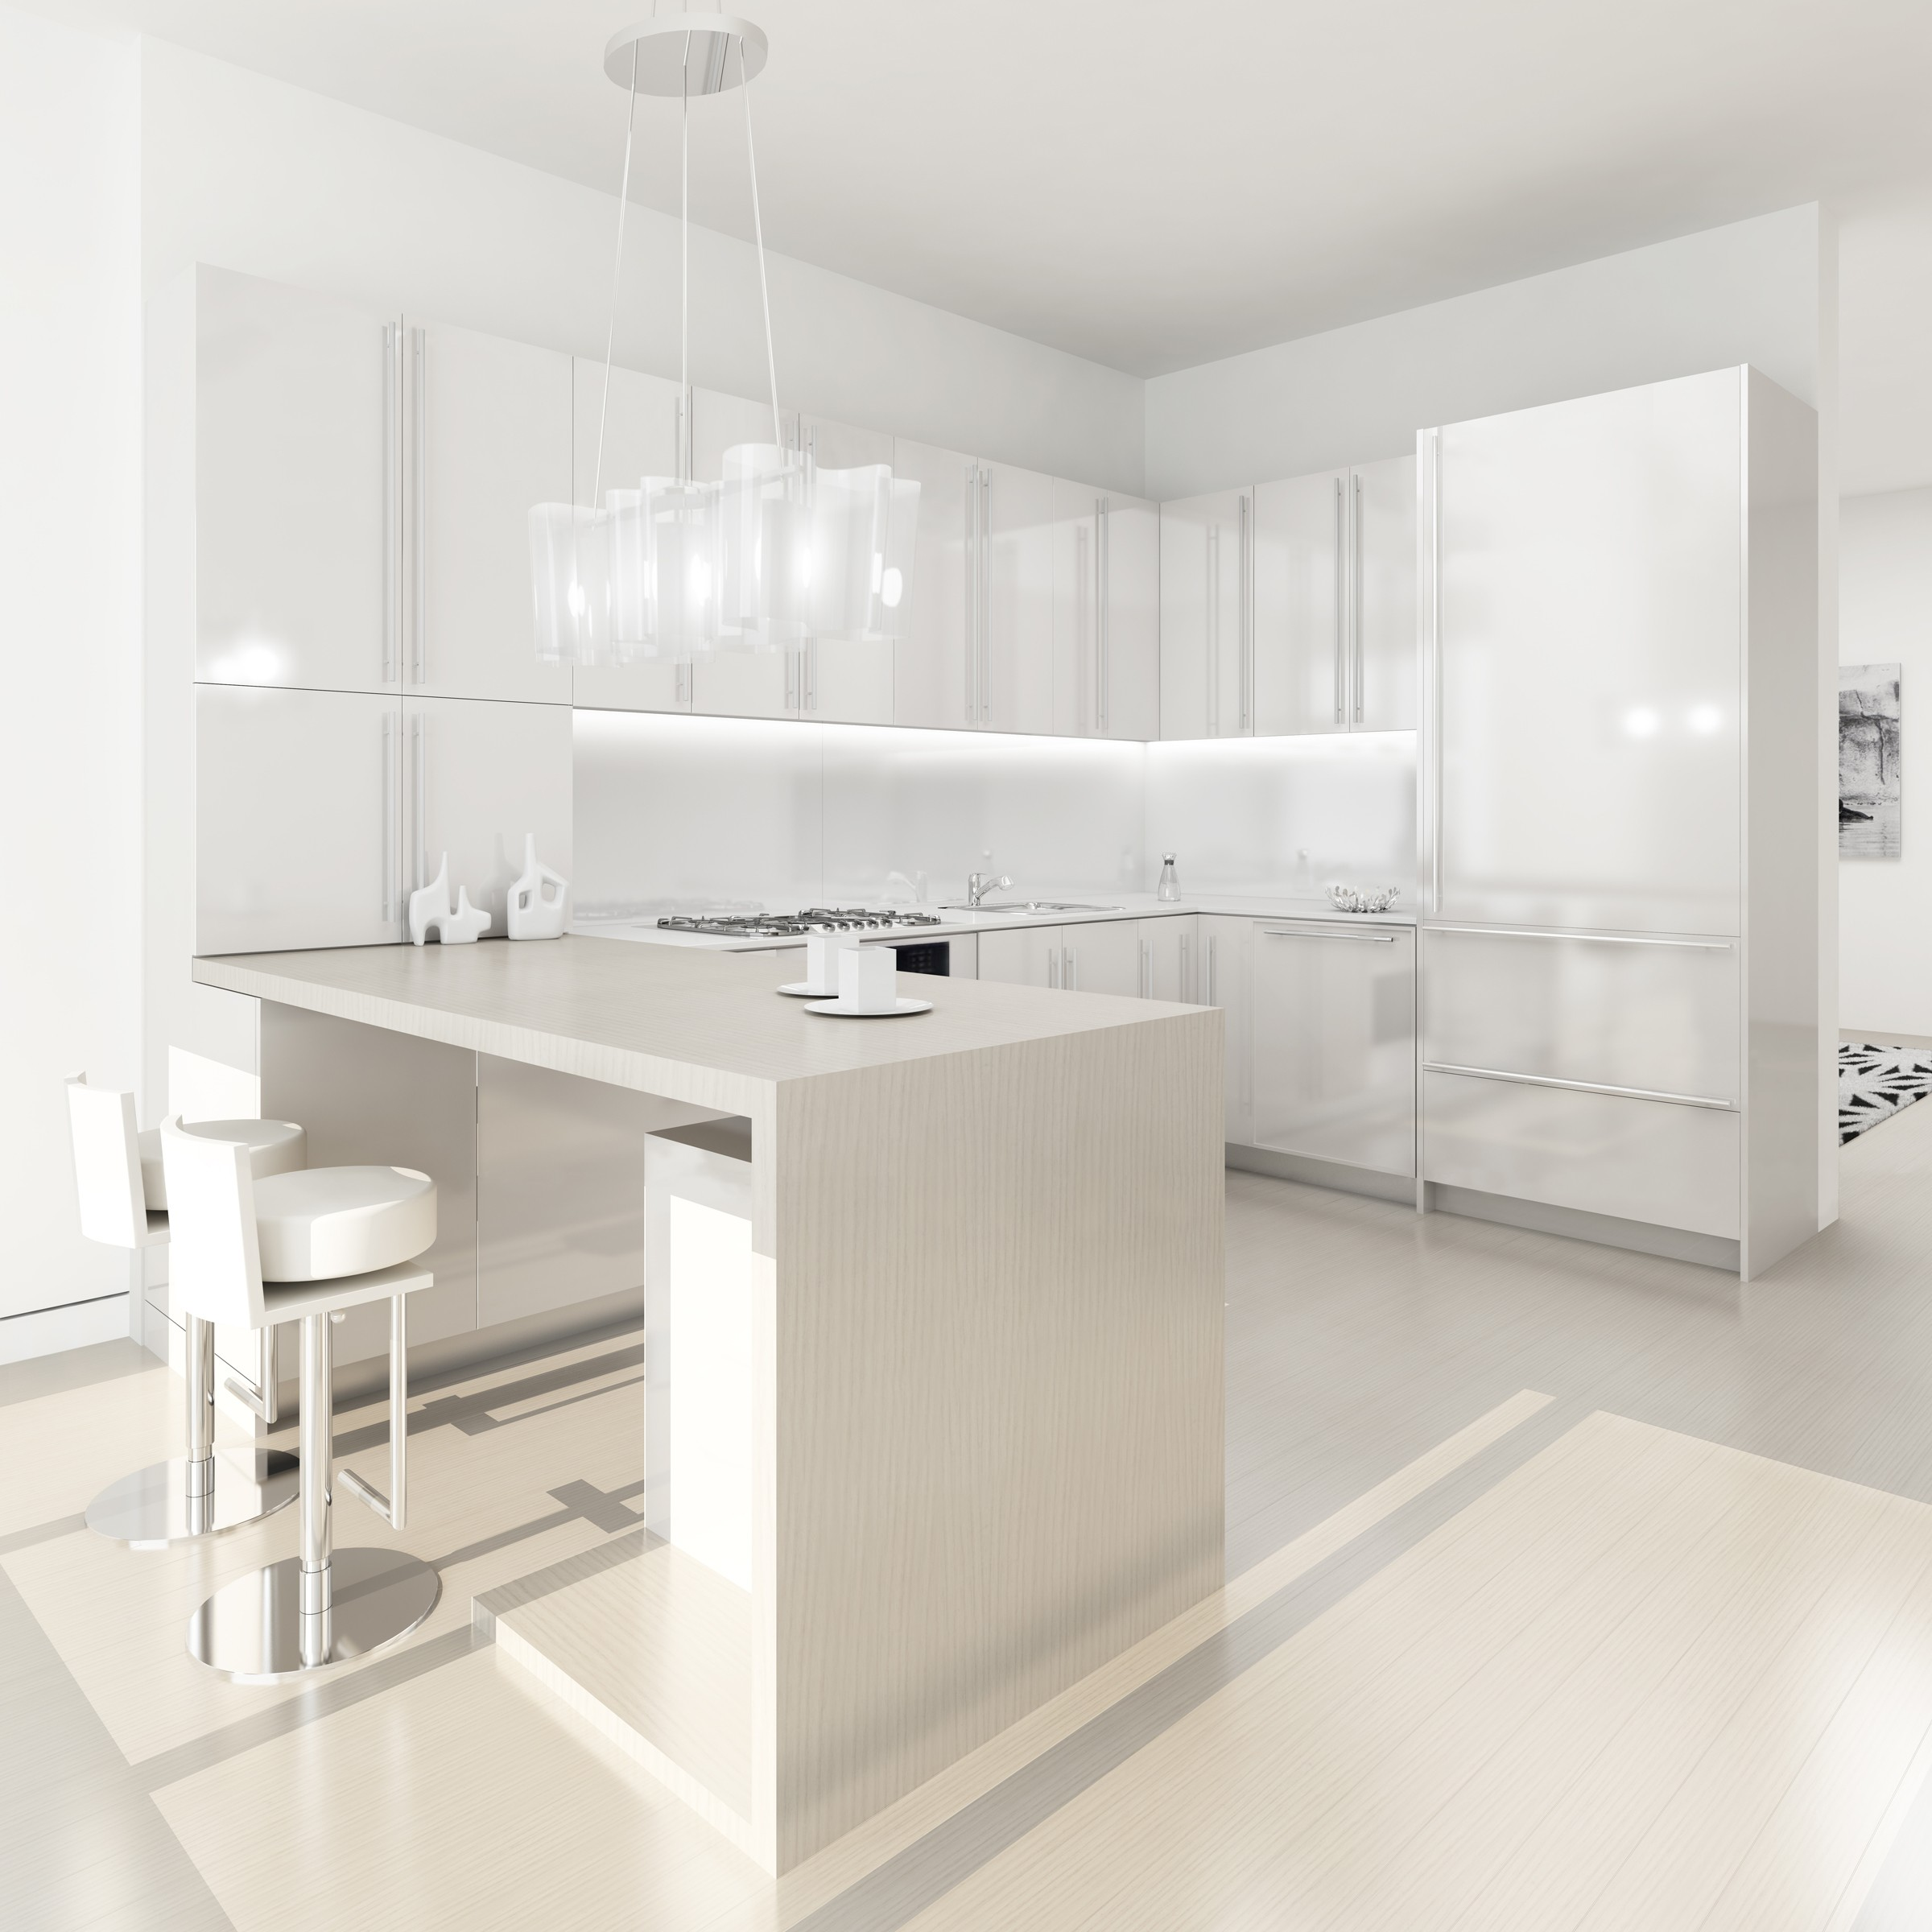 Pure White Basic Kitchen Design (Image 12 of 16)